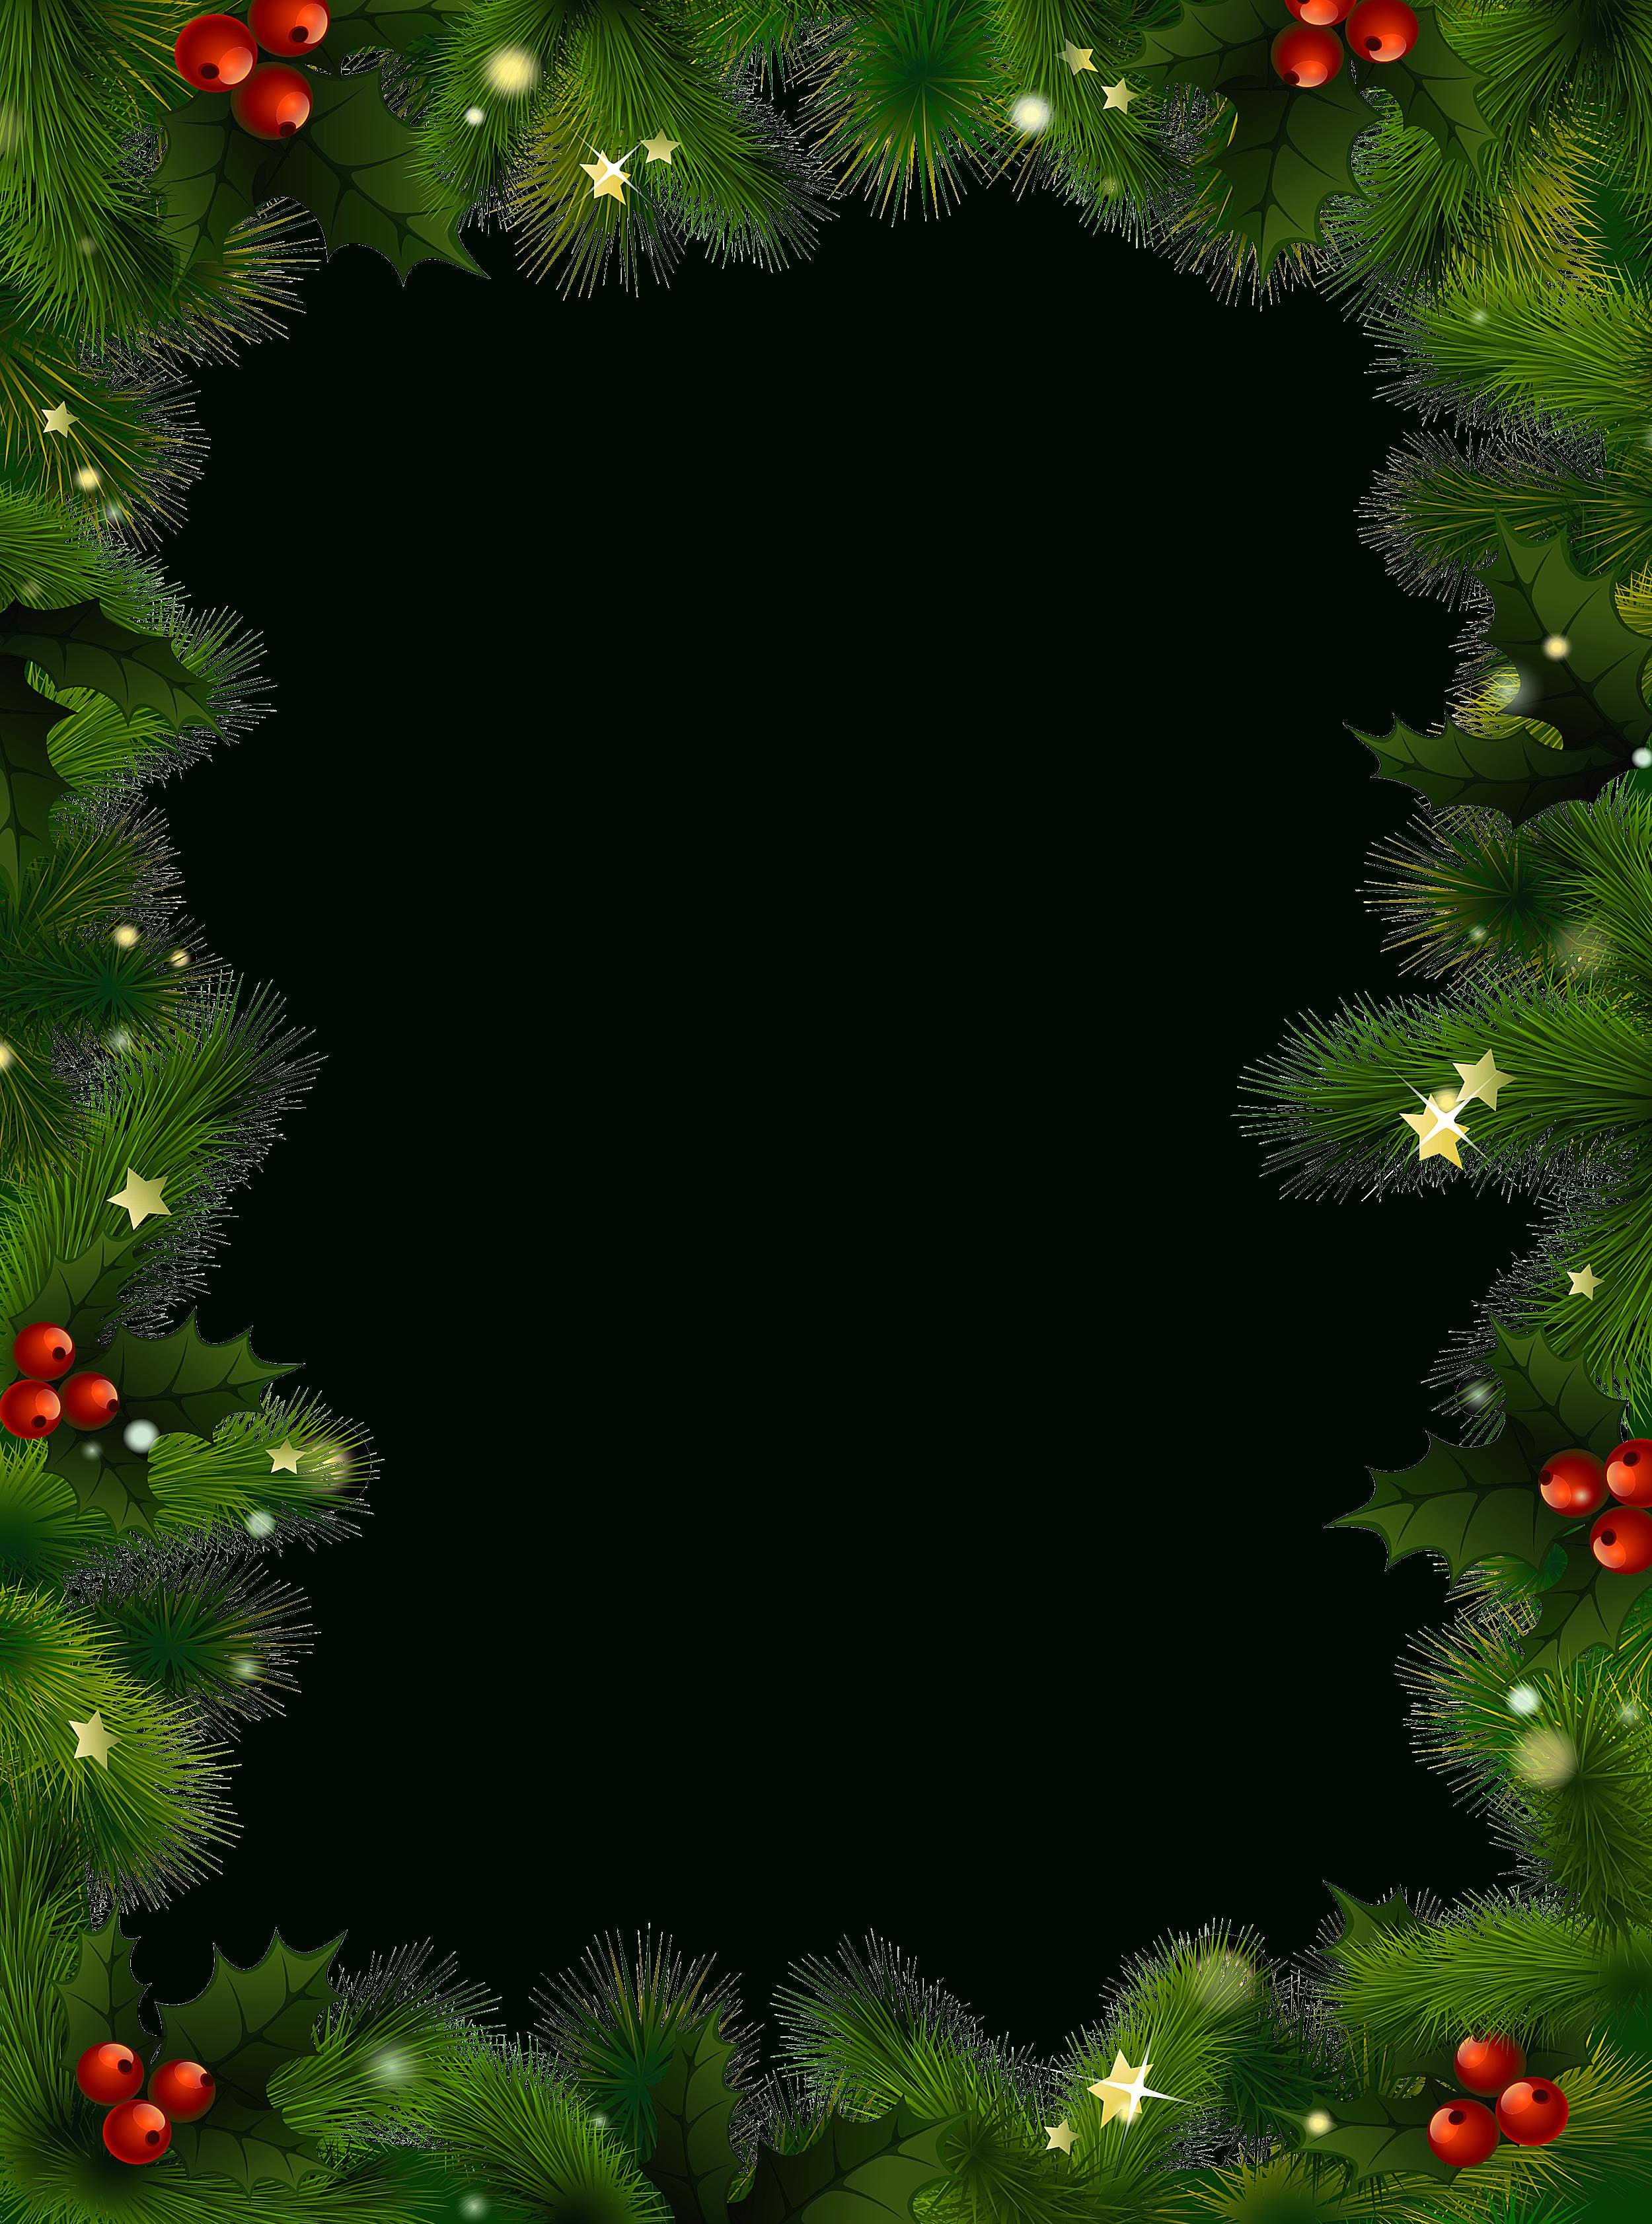 Free Christmas Clip Art Border, Download Free Clip Art, Free Clip - Free Printable Christmas Backgrounds